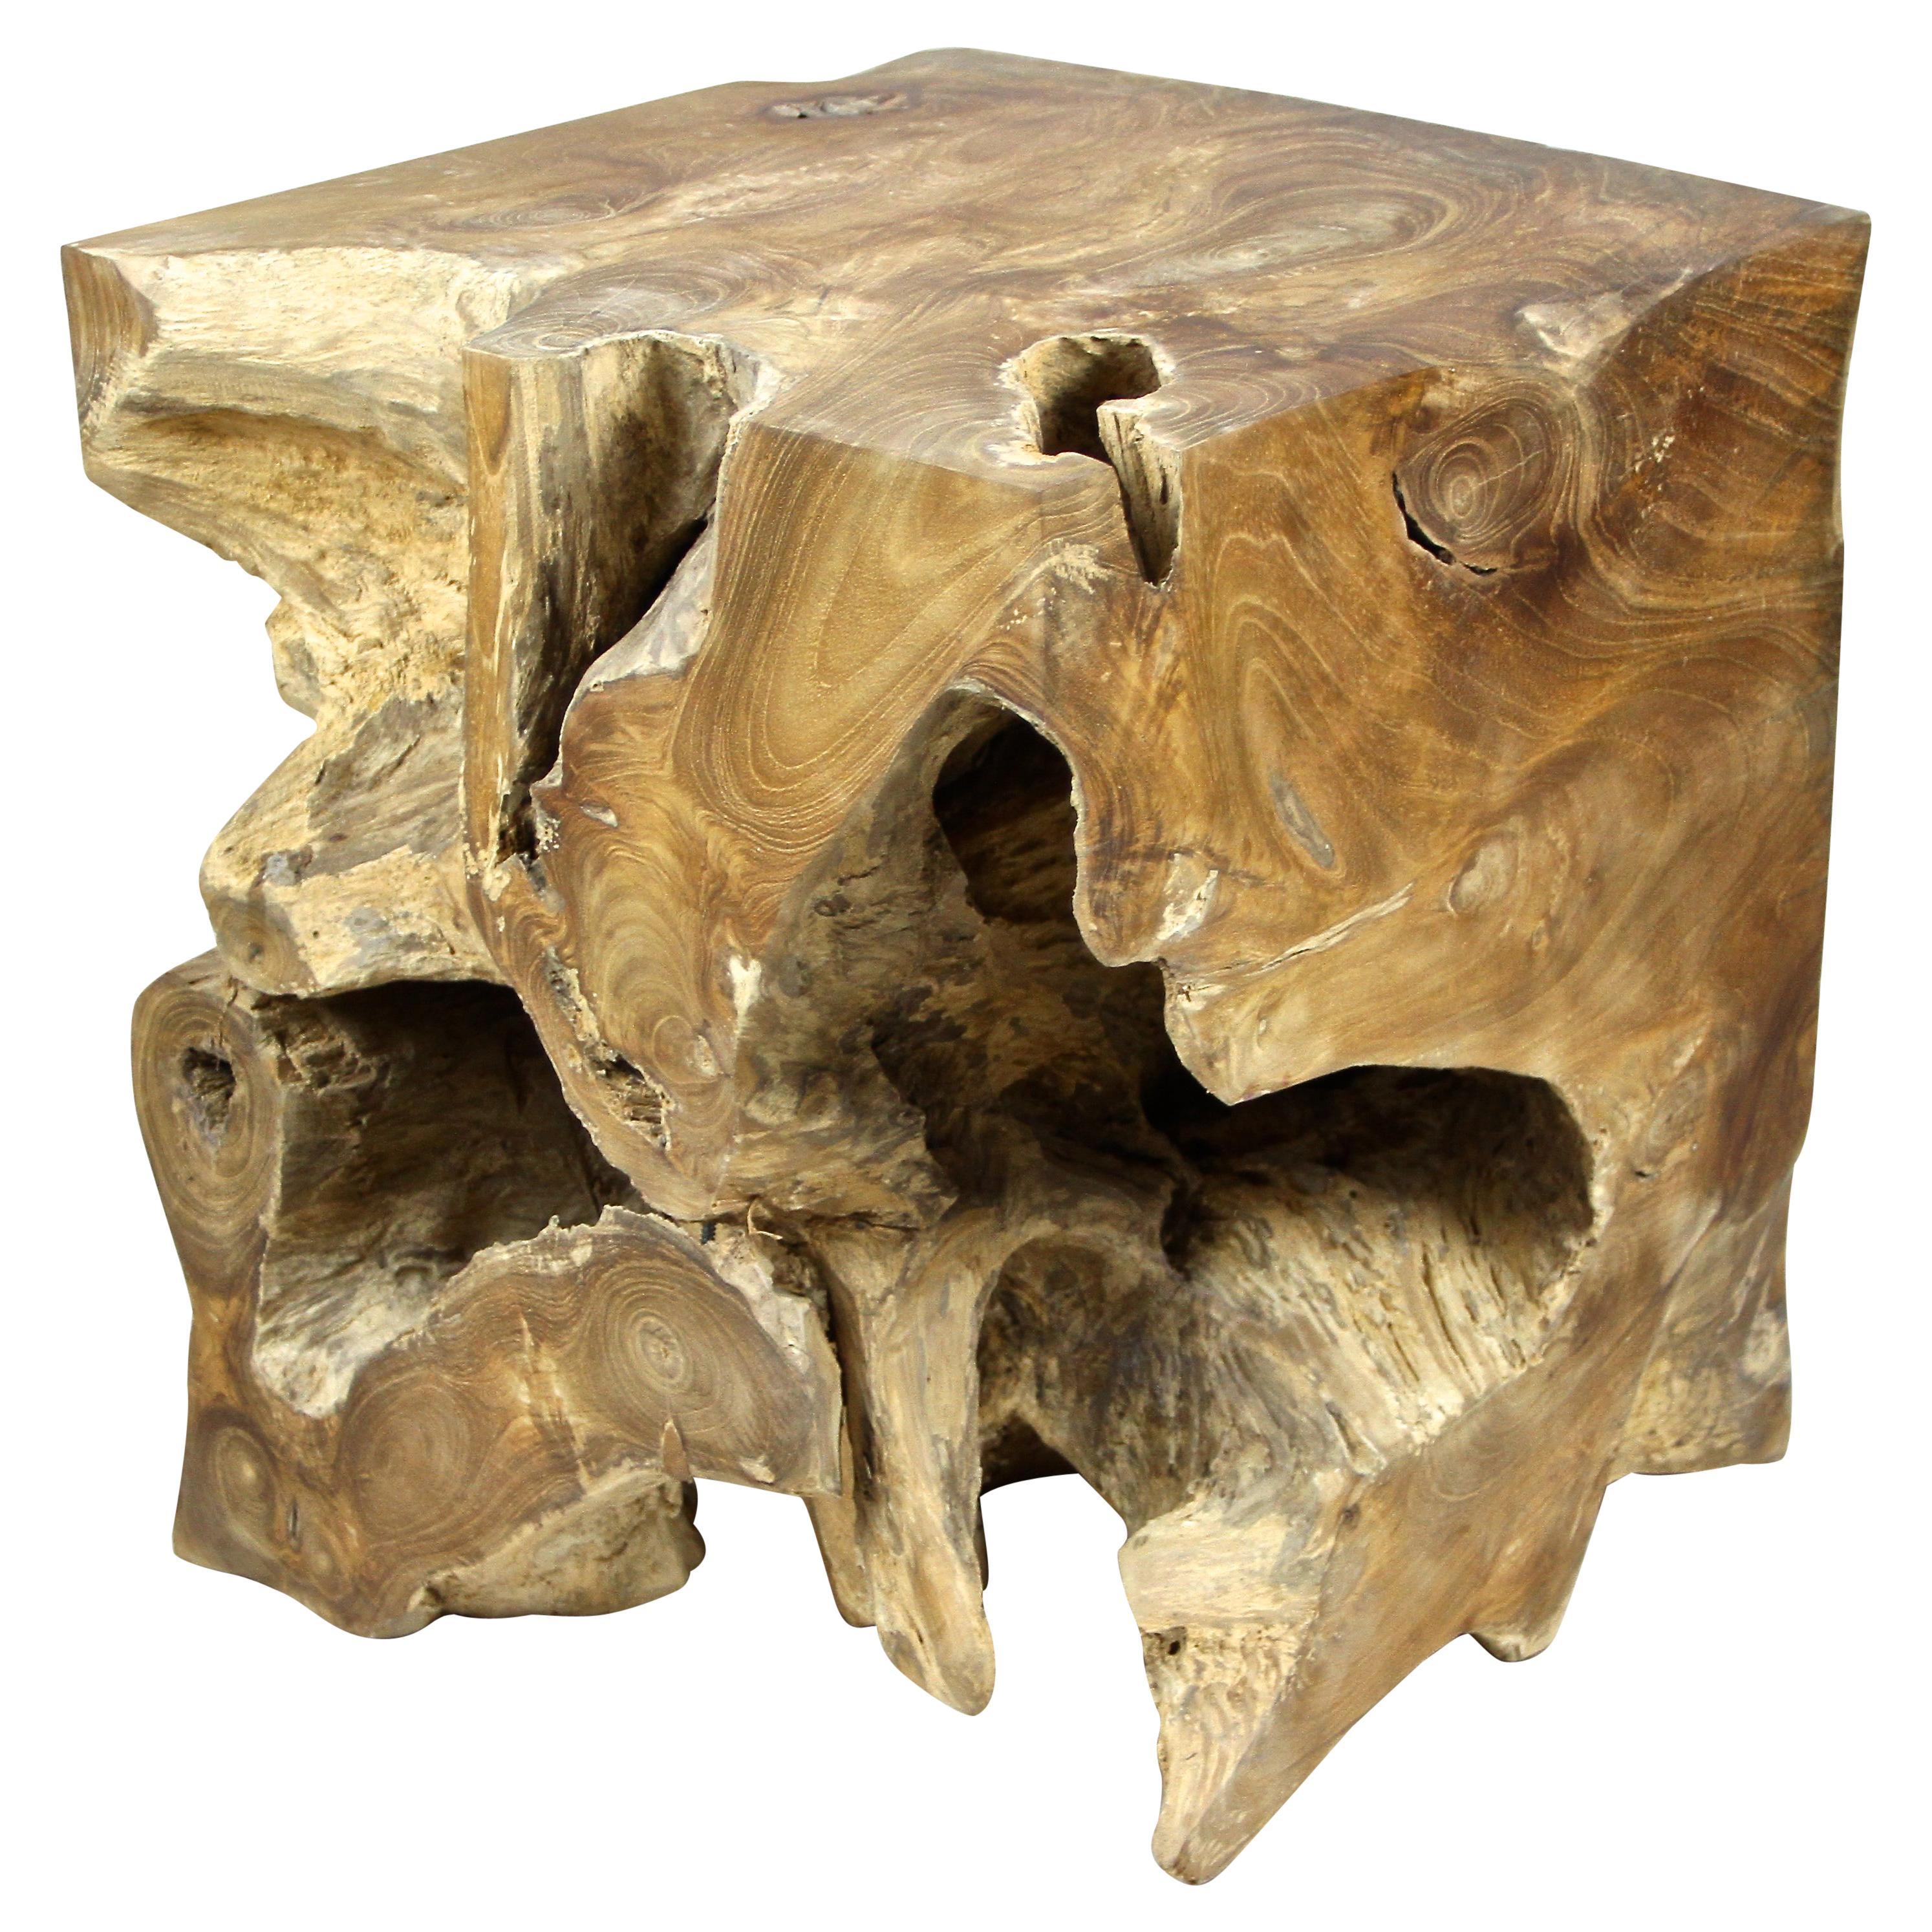 Teak Root Side Table or Stool Oiled, Organic Modern